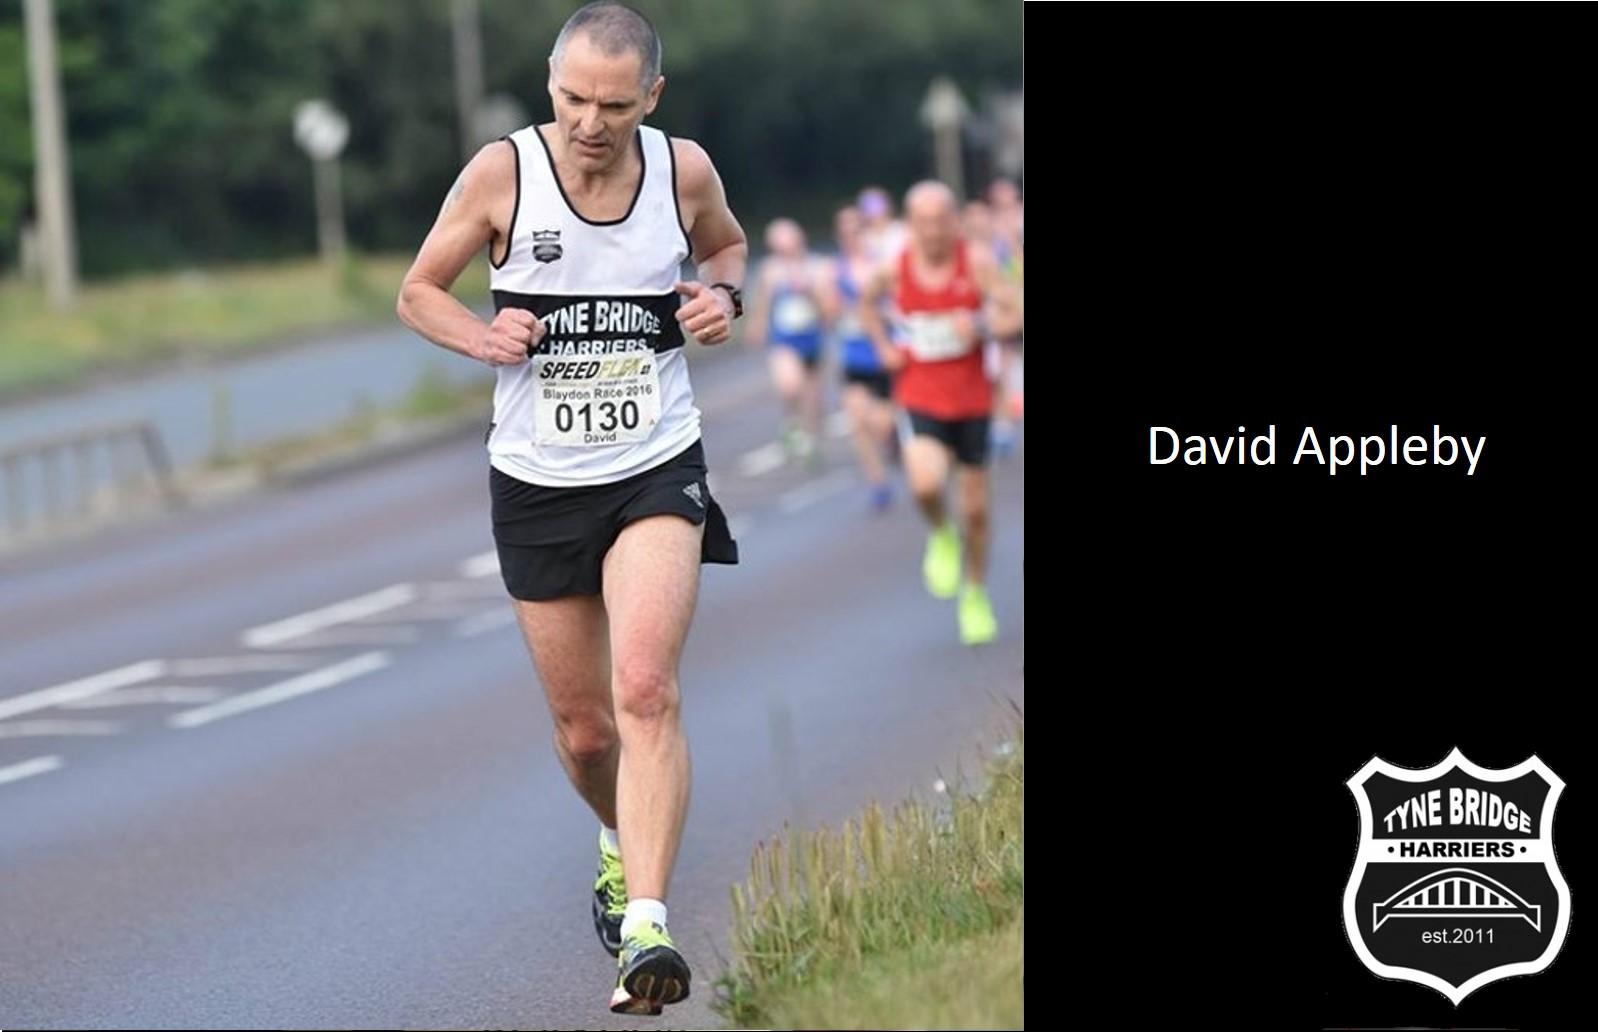 David Appleby